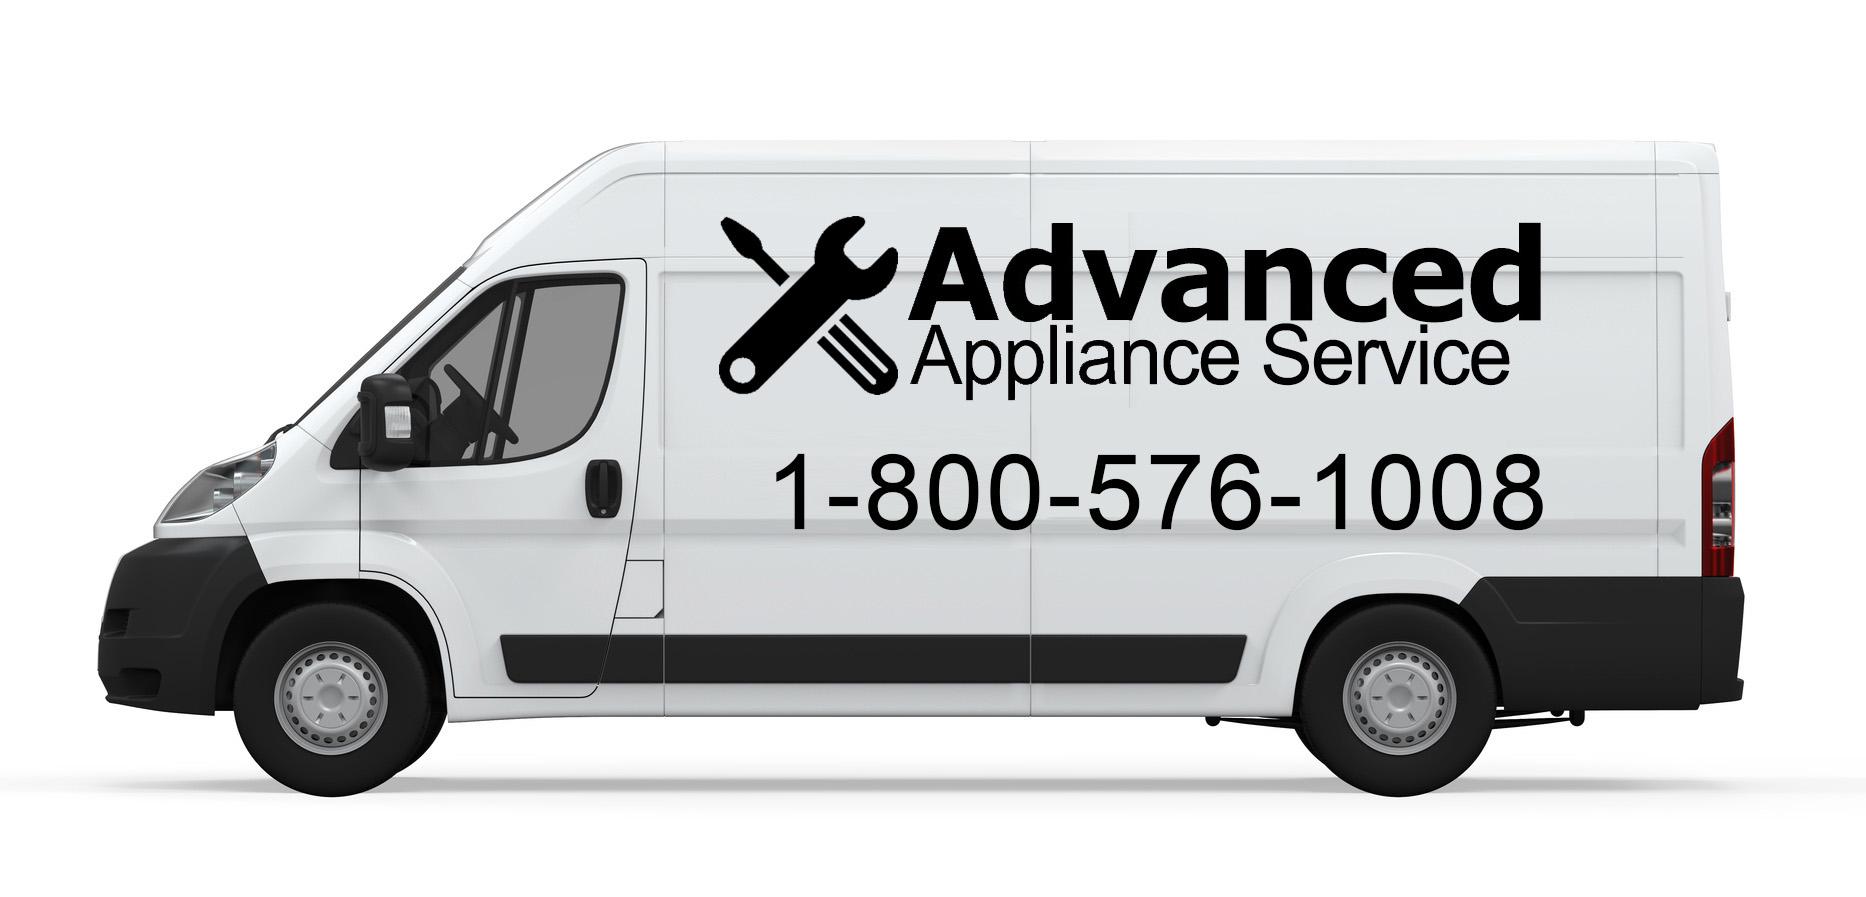 Appliance Service Manalapan Nj Advanced Appliance Service